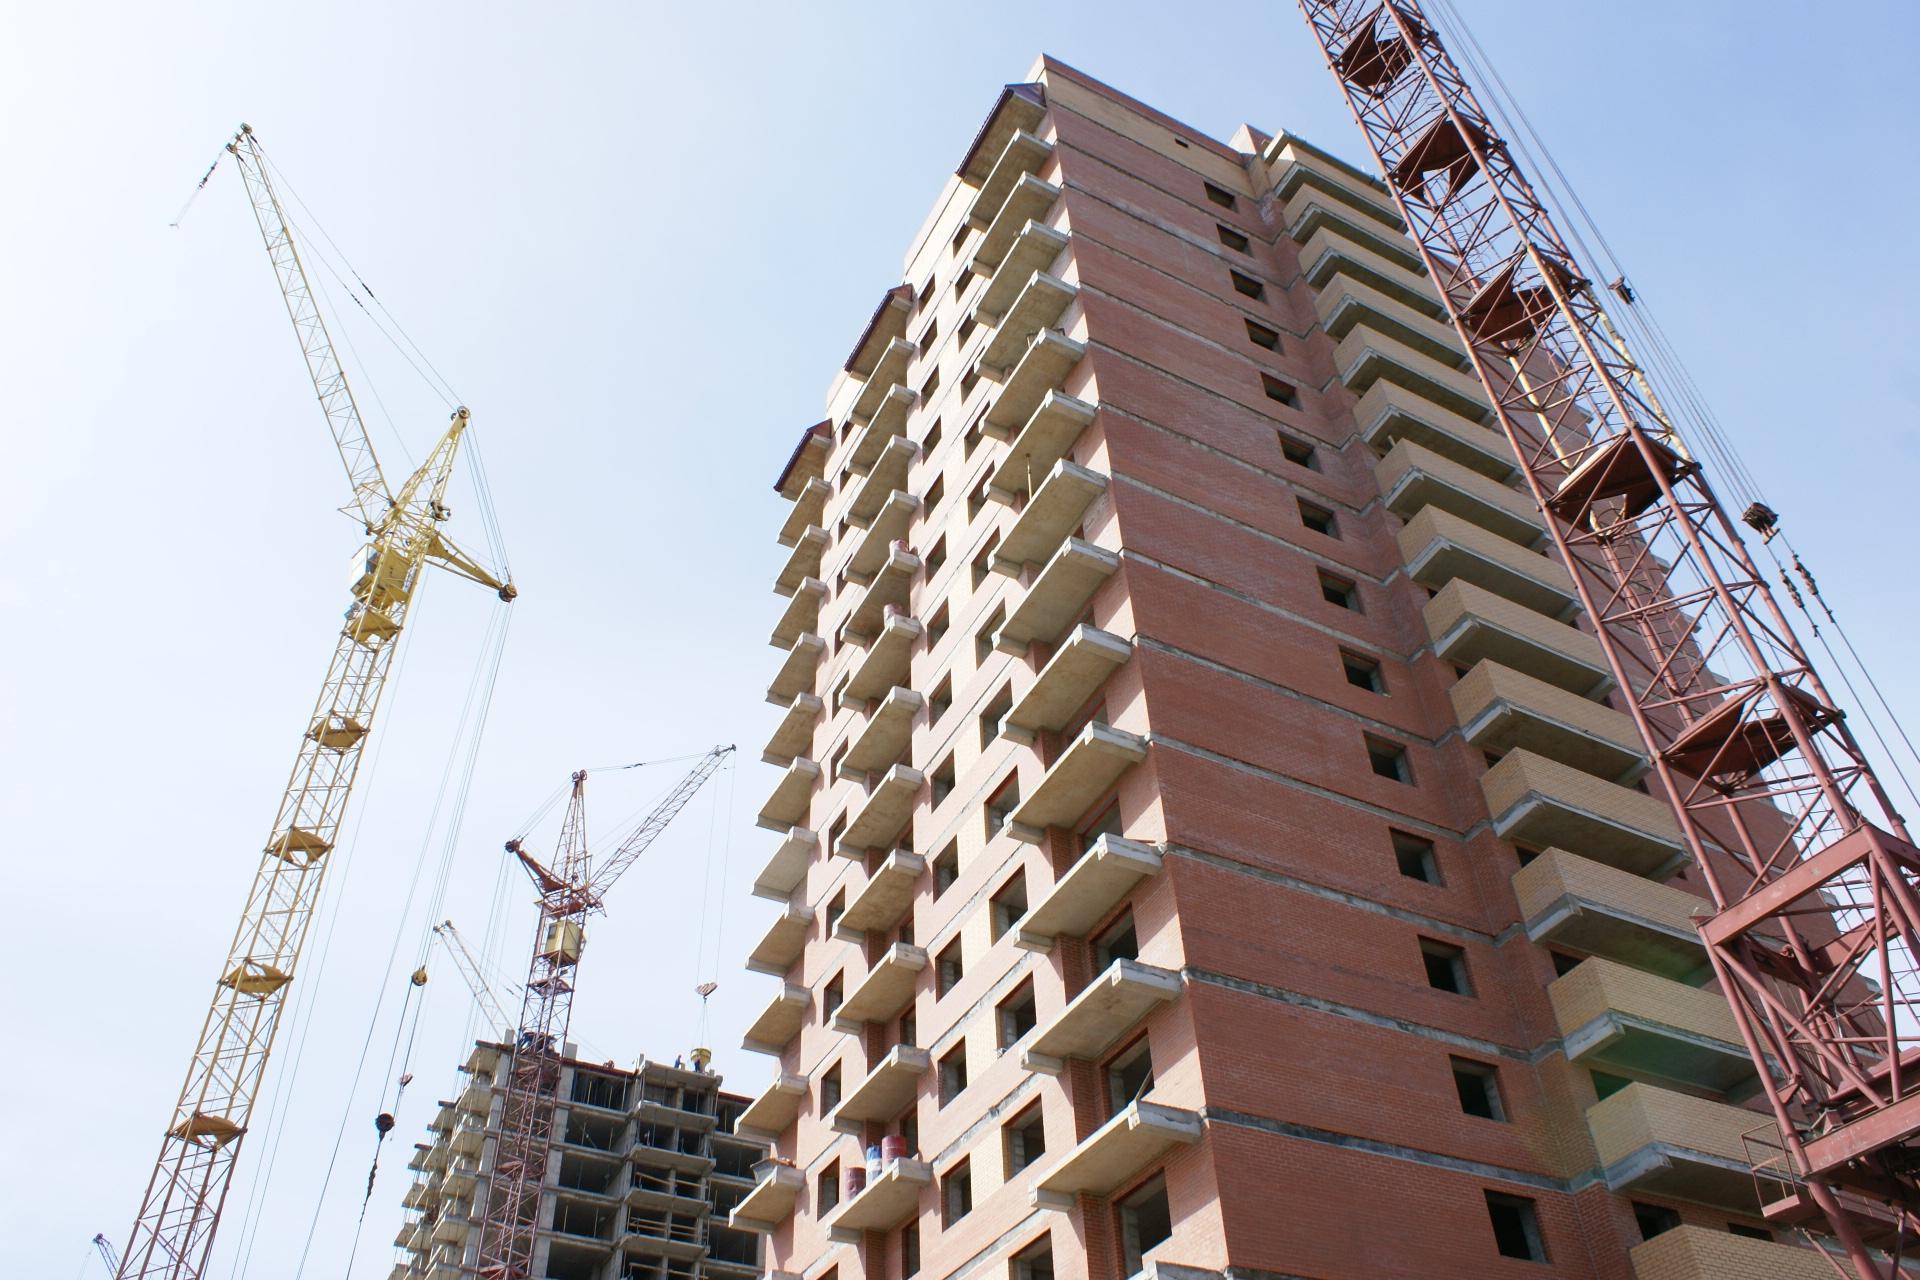 схема покупки квартиры по переуступке по ипотеке